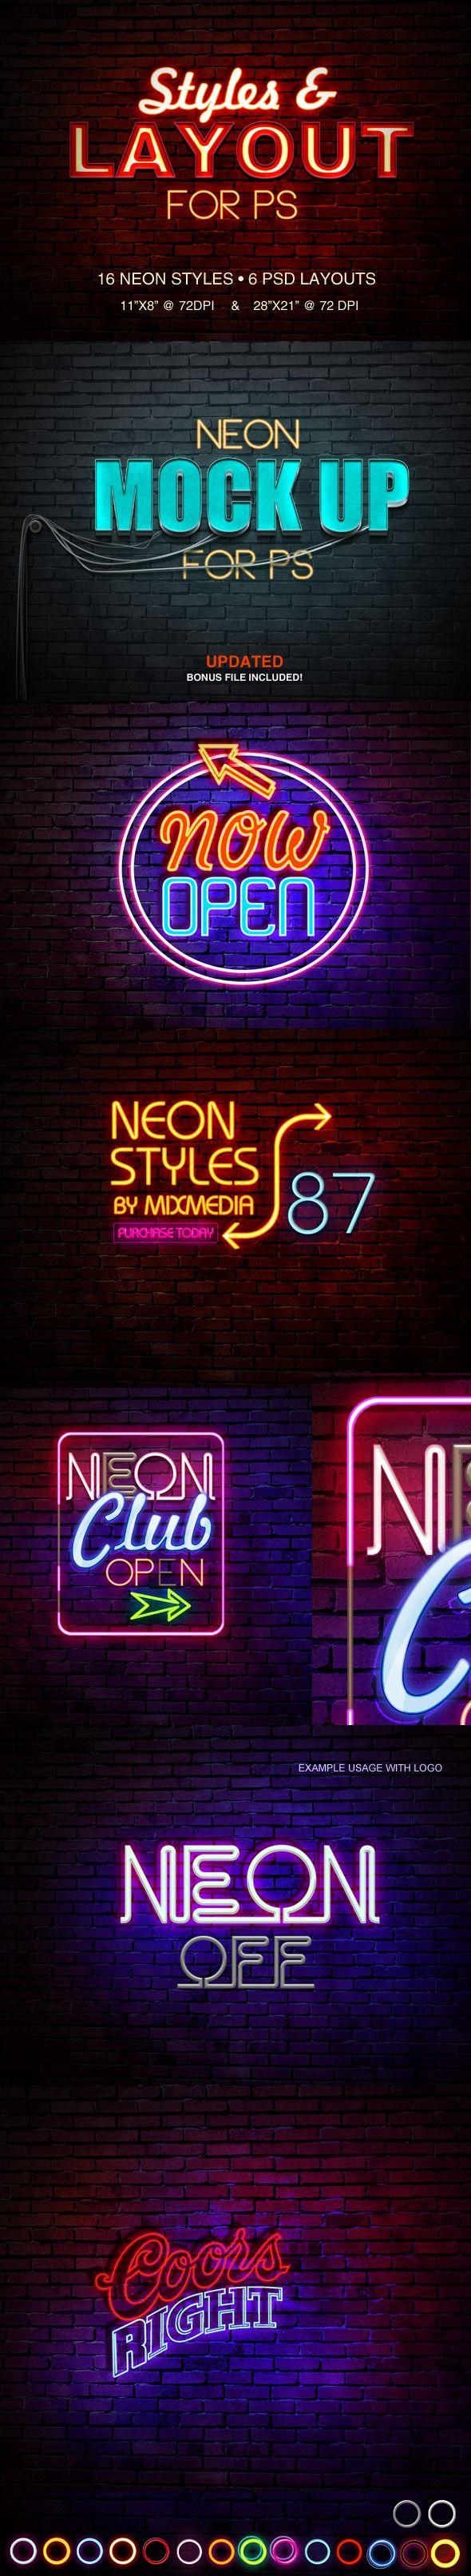 PS Neon Styles on Behance